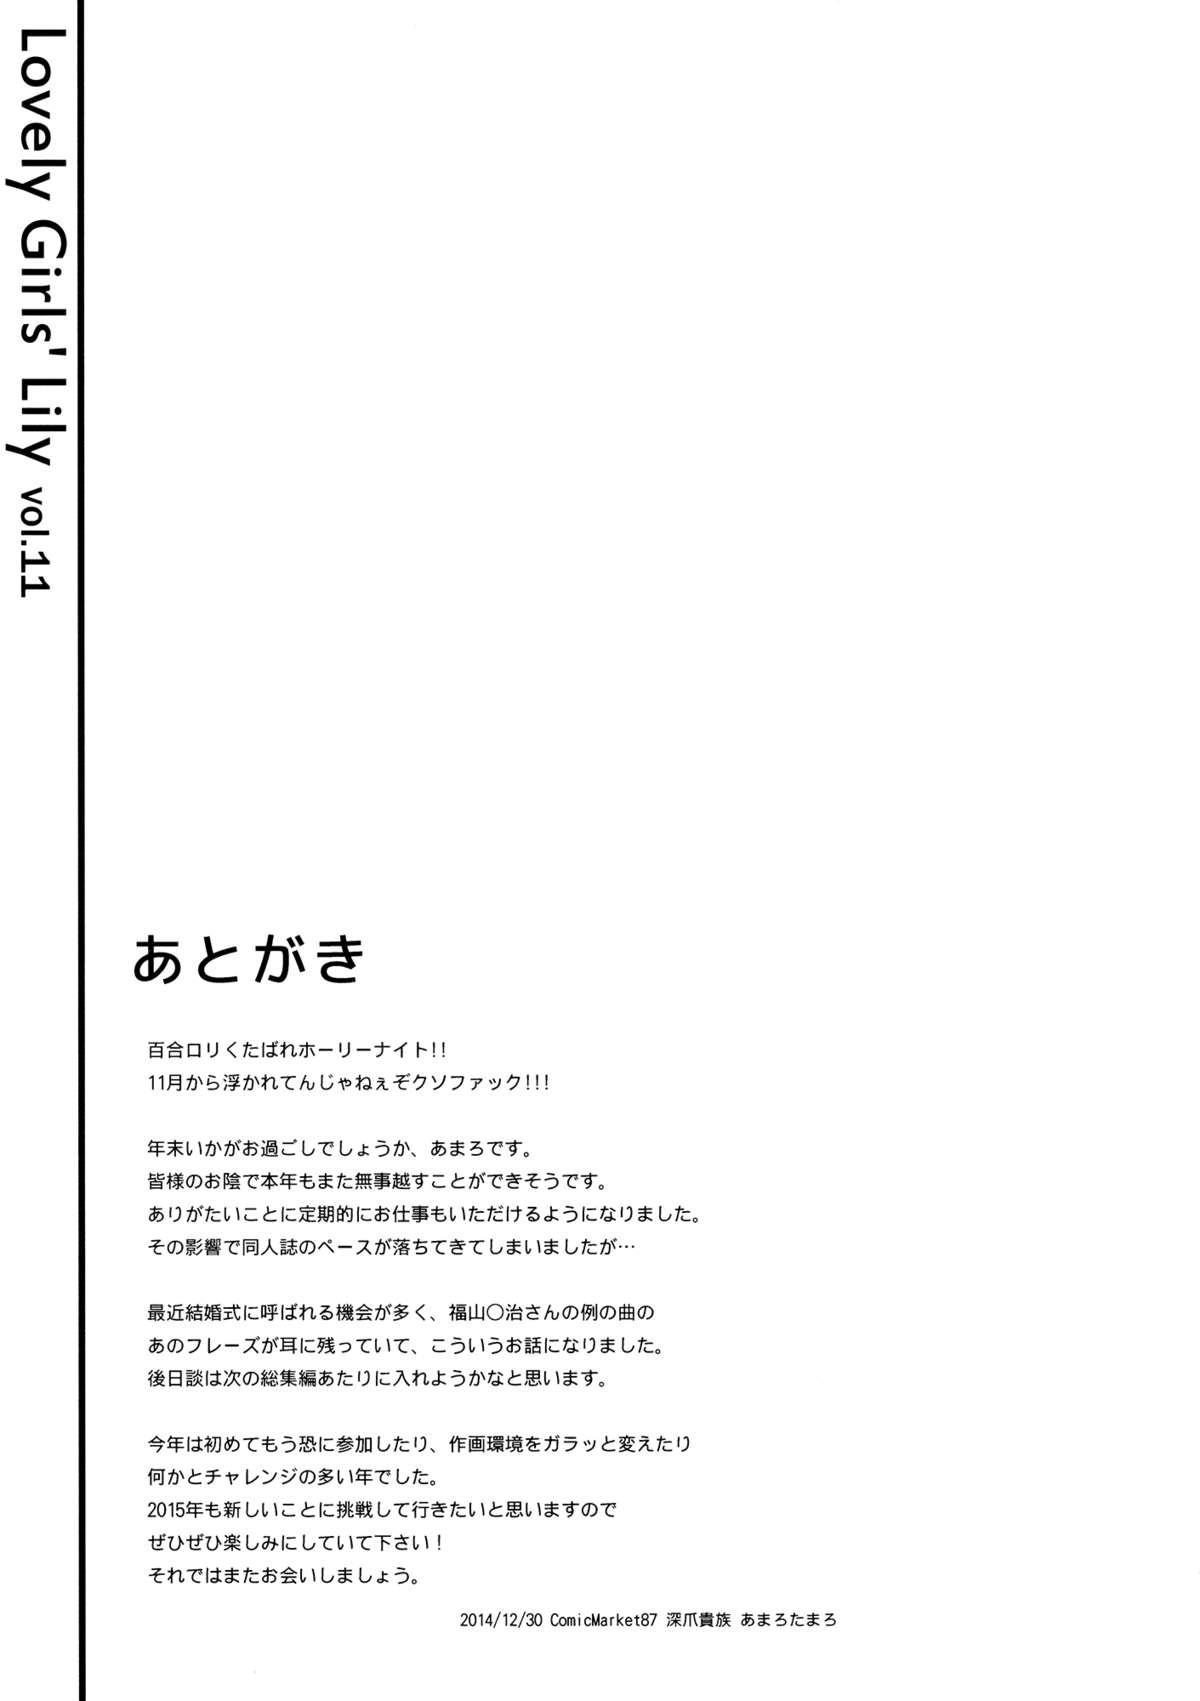 Lovely Girls' Lily Vol. 11 19